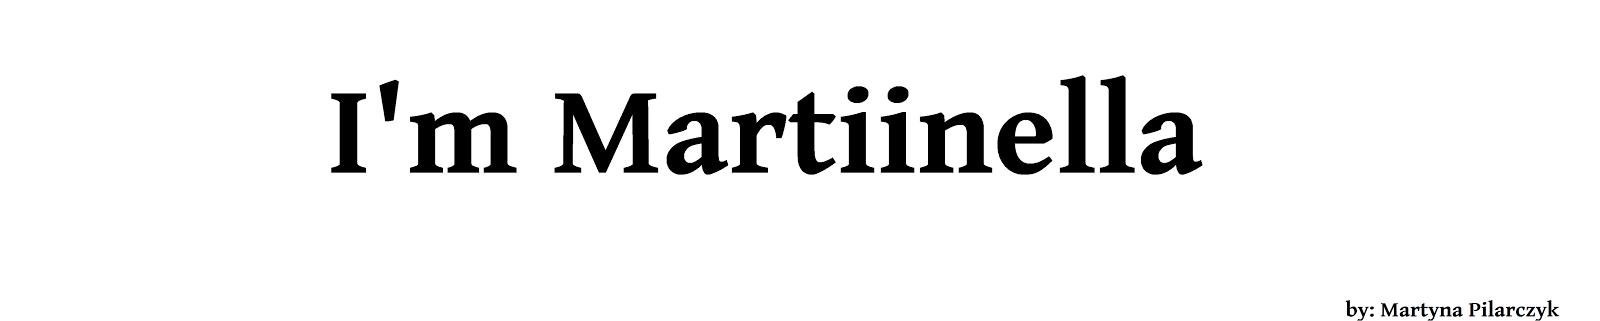 I'm Martiinella